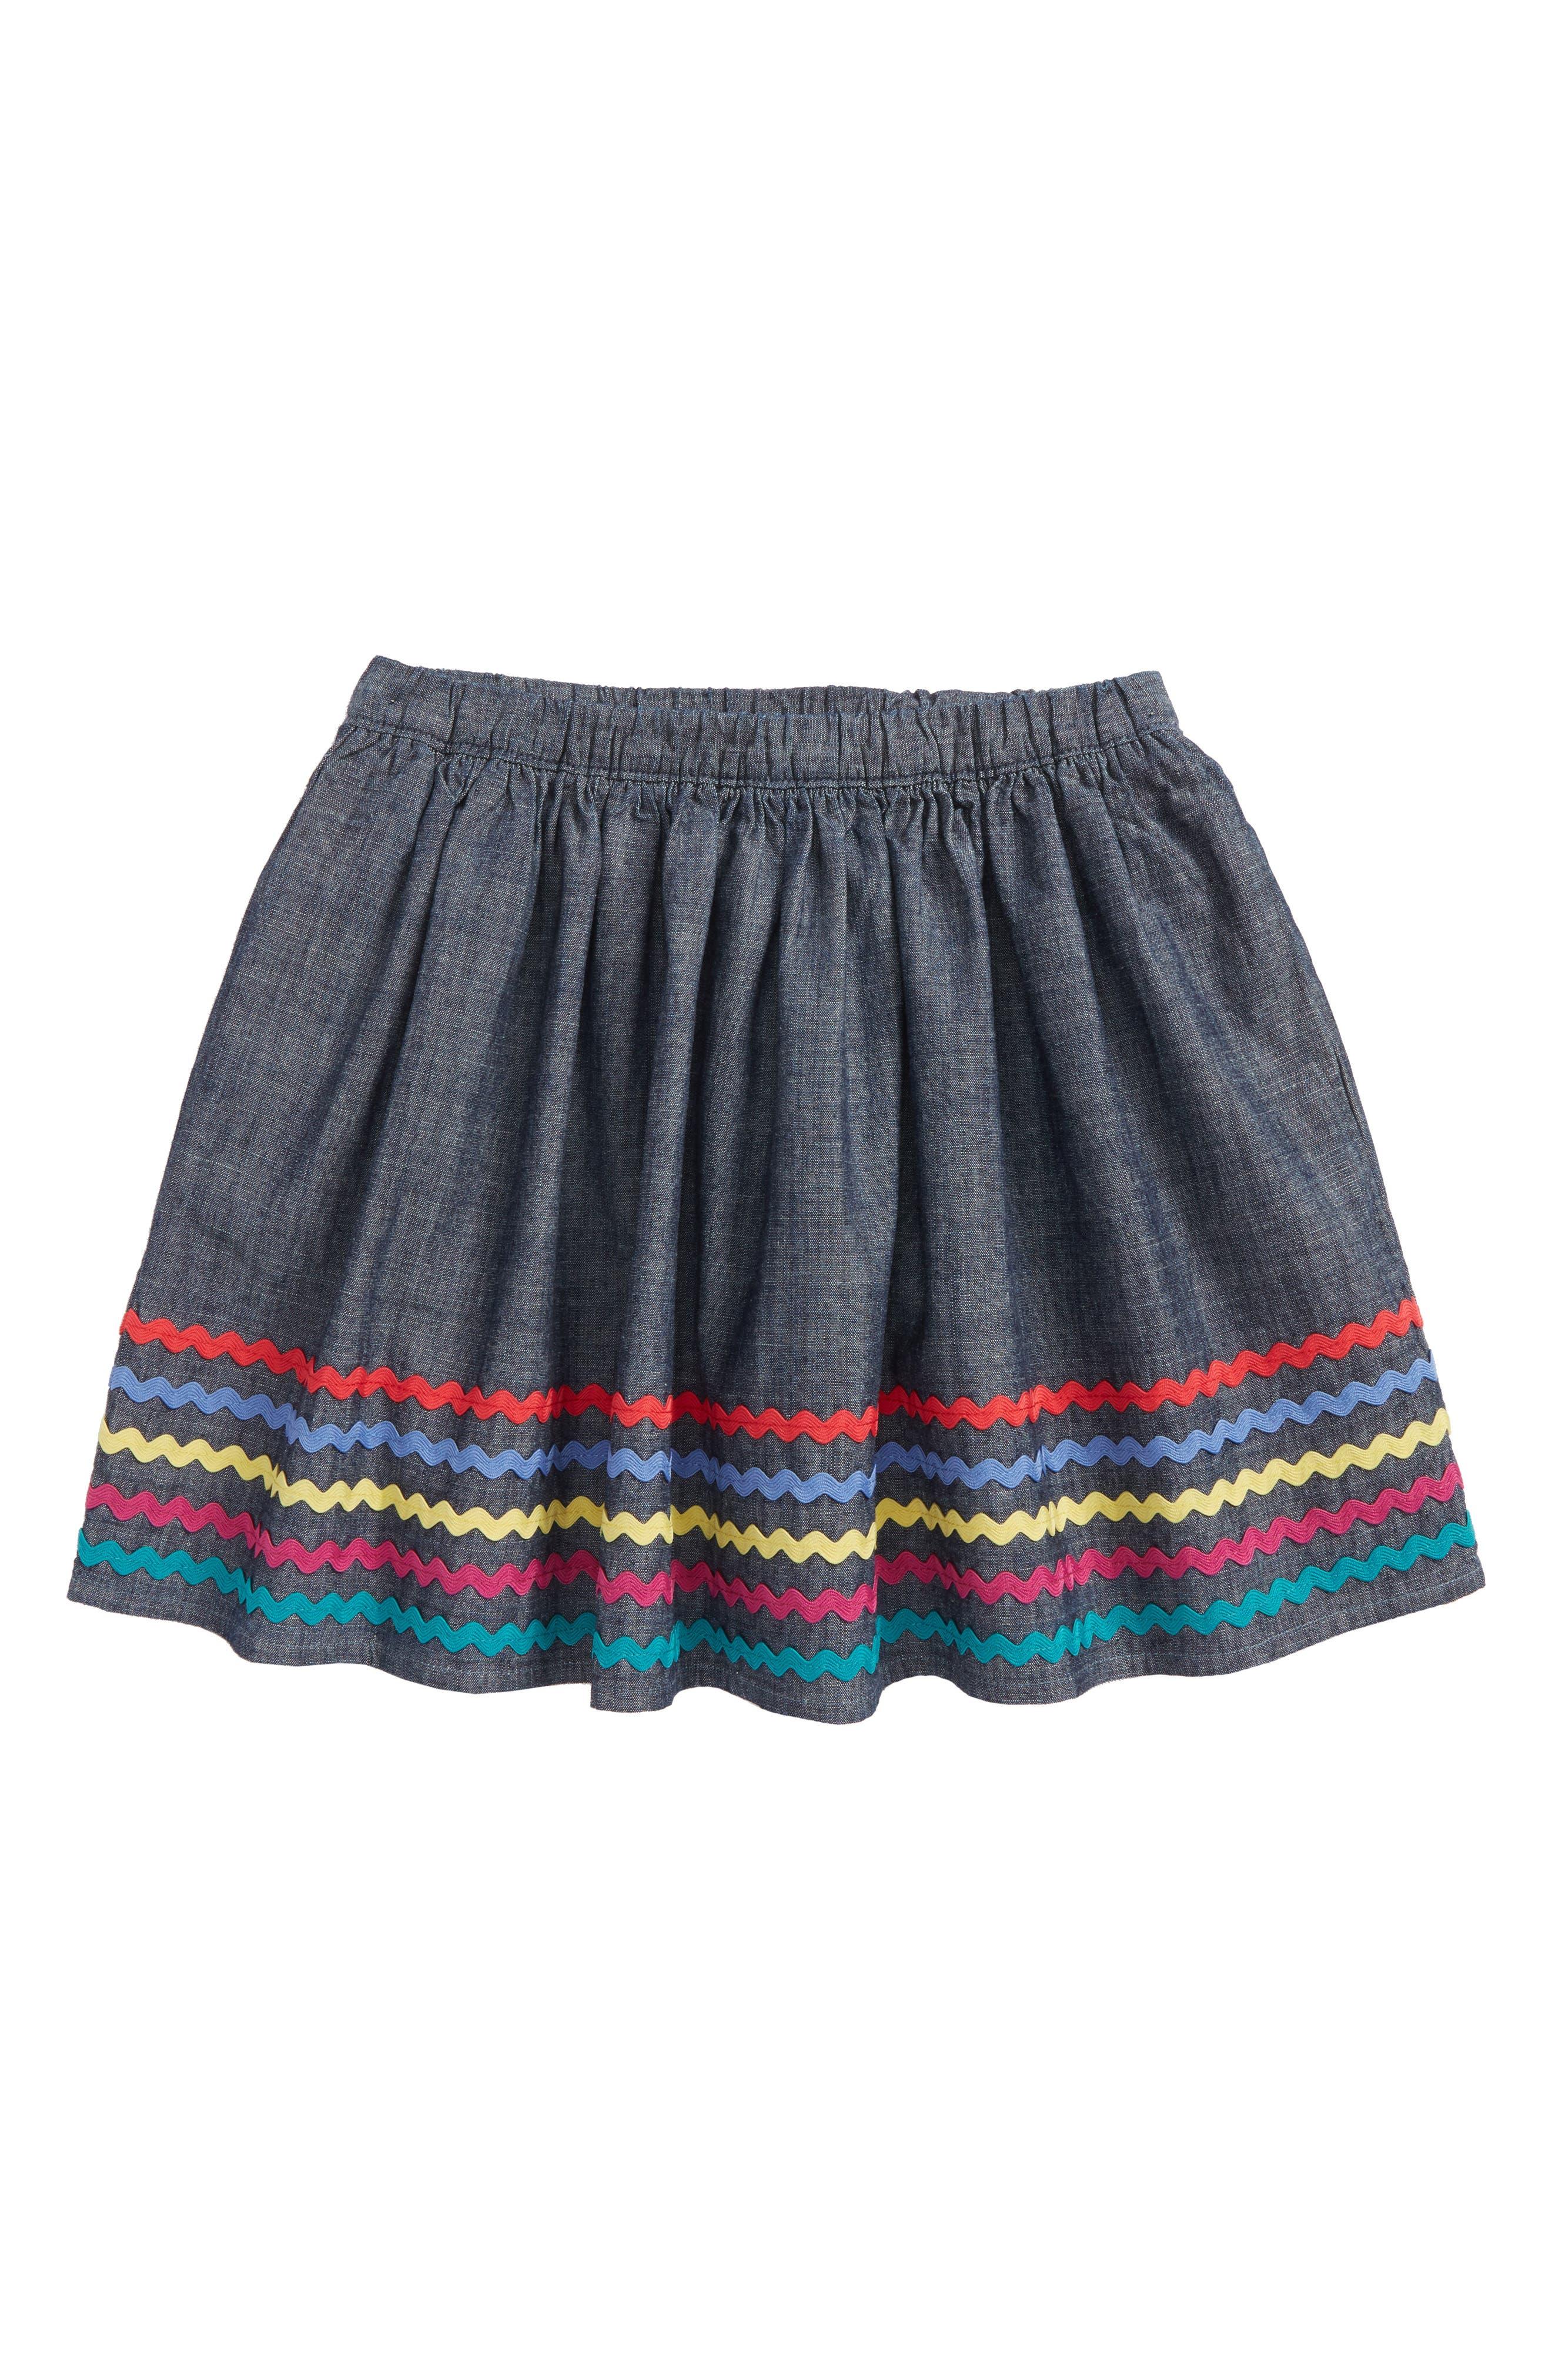 Rickrack Twirl Skirt,                         Main,                         color, Blue Chambray